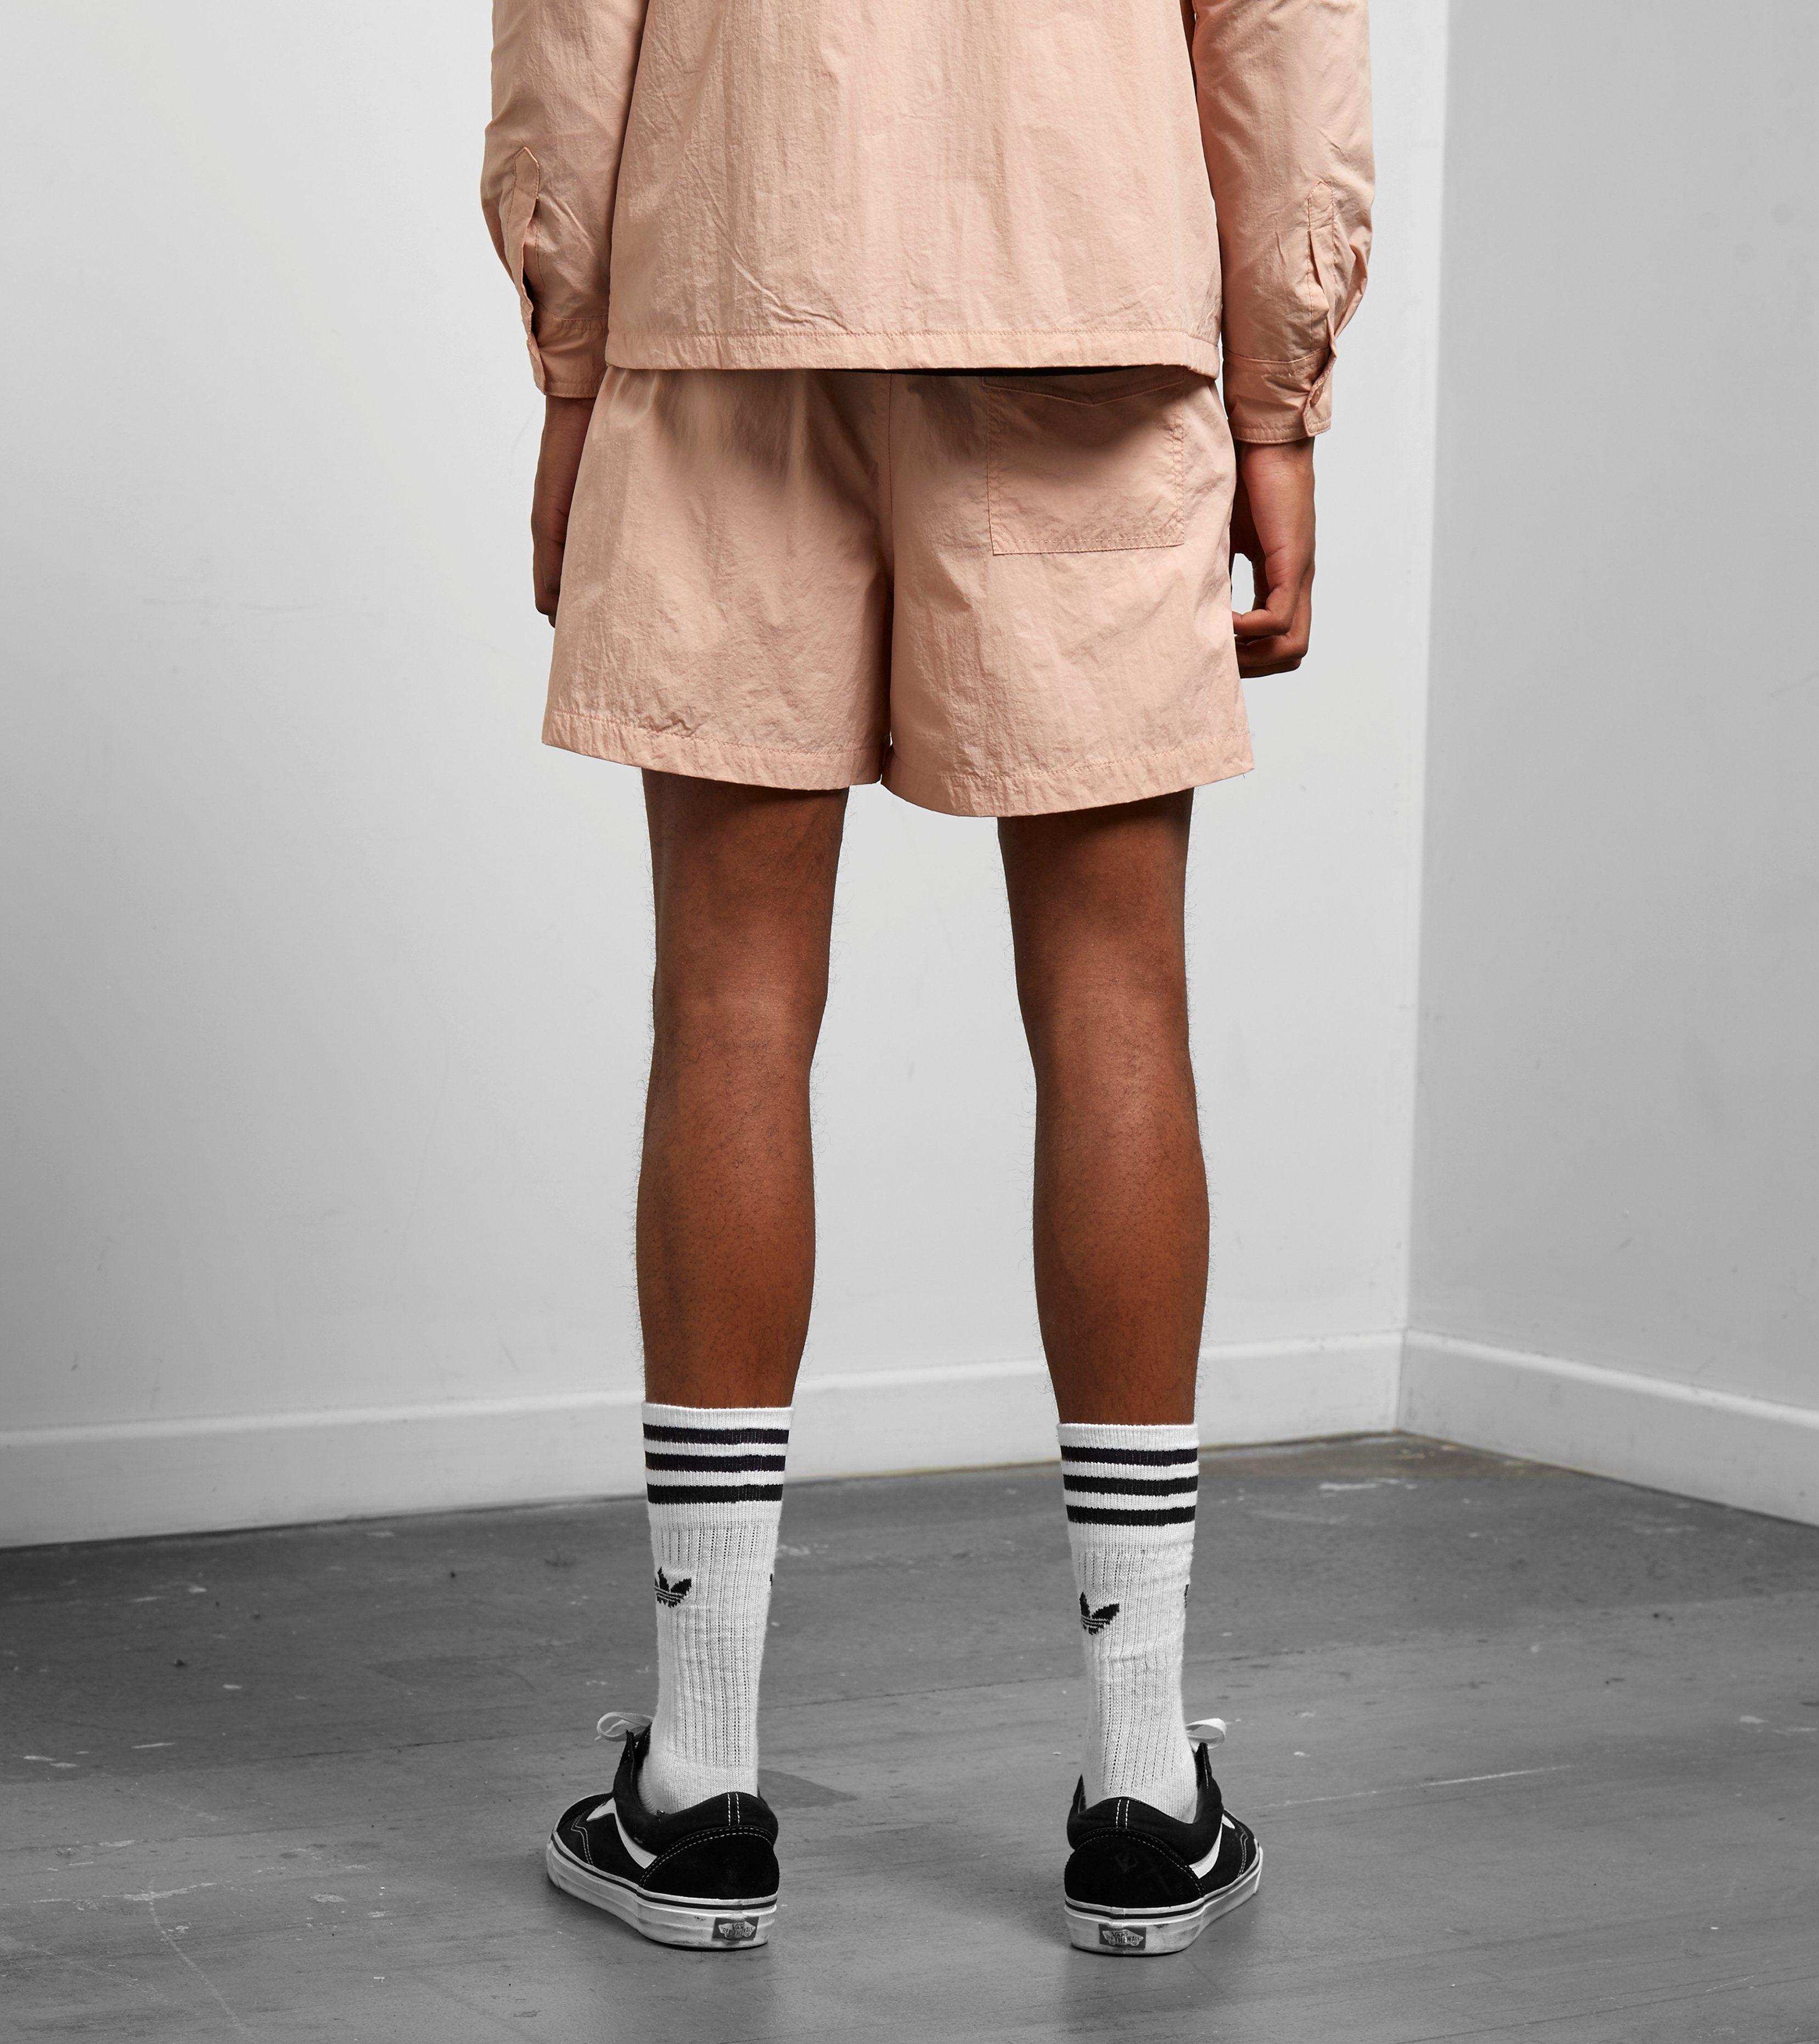 Fila Satanasso Shorts - size? Exclusive